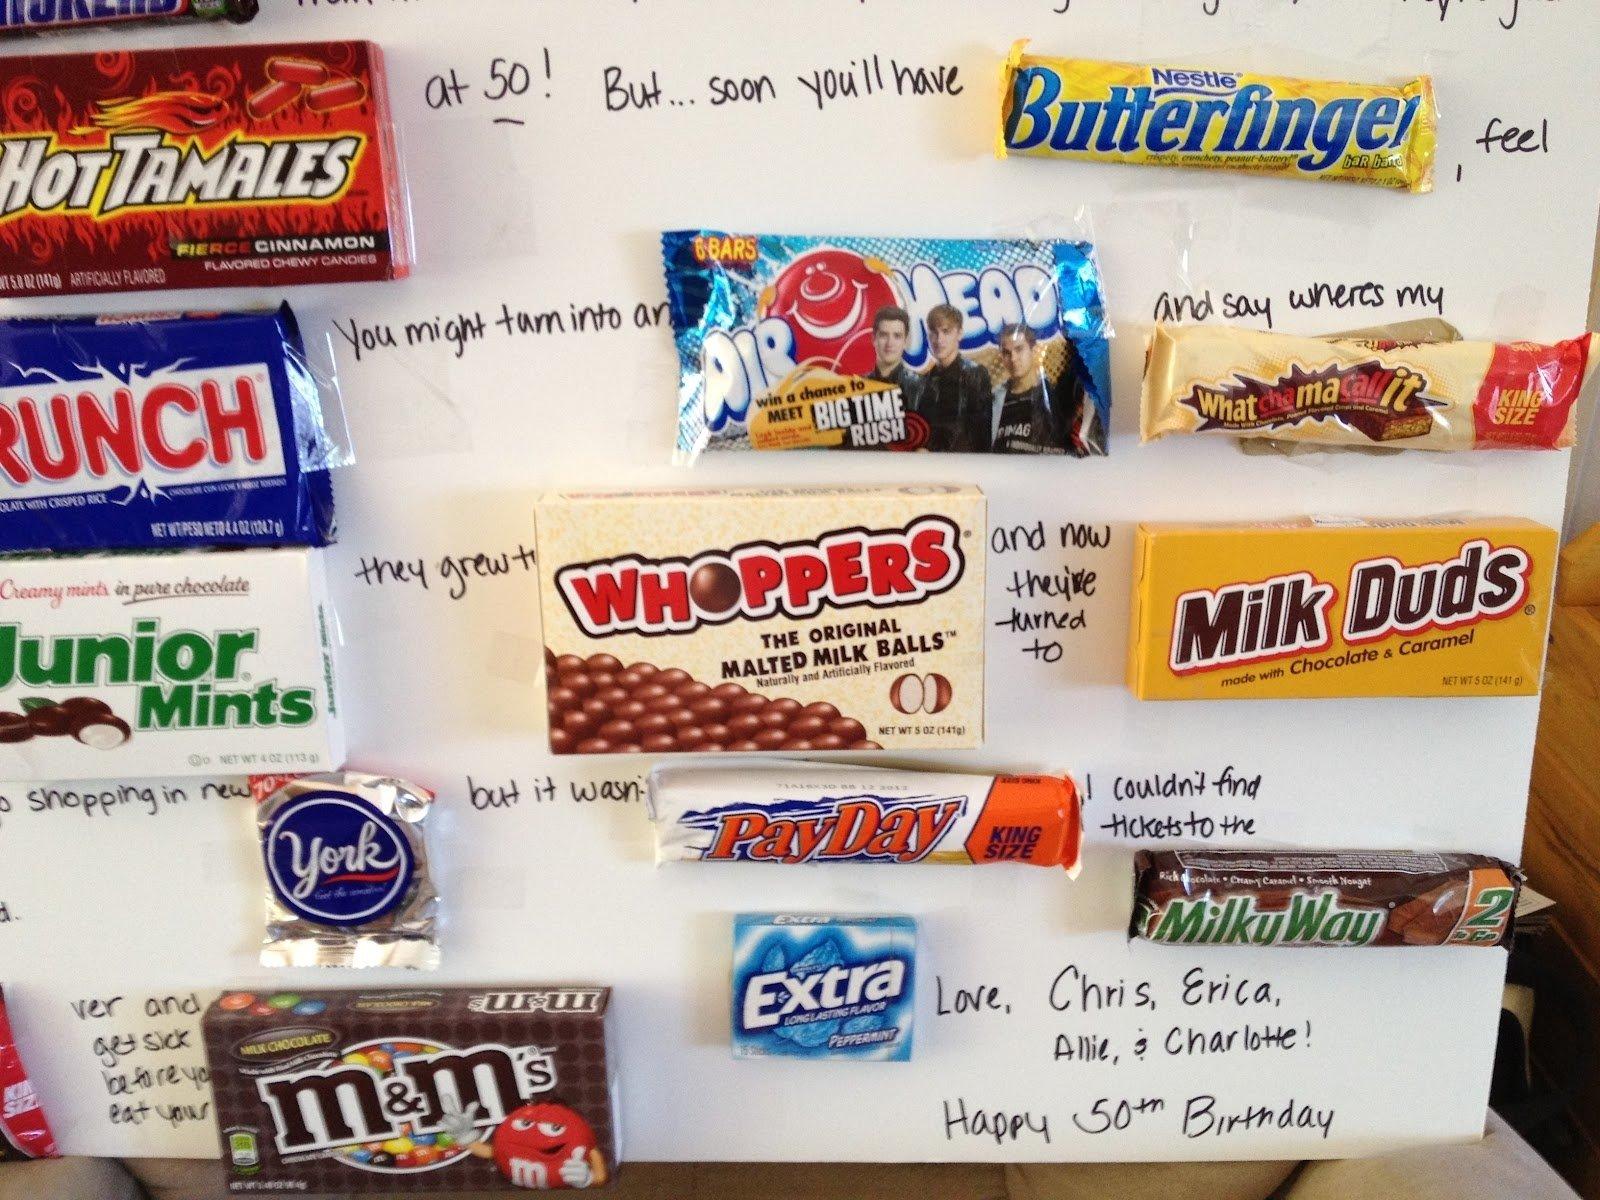 10 Trendy Ideas For 50Th Birthday Gift 40th birthday ideas 50th birthday present ideas for your mom 5